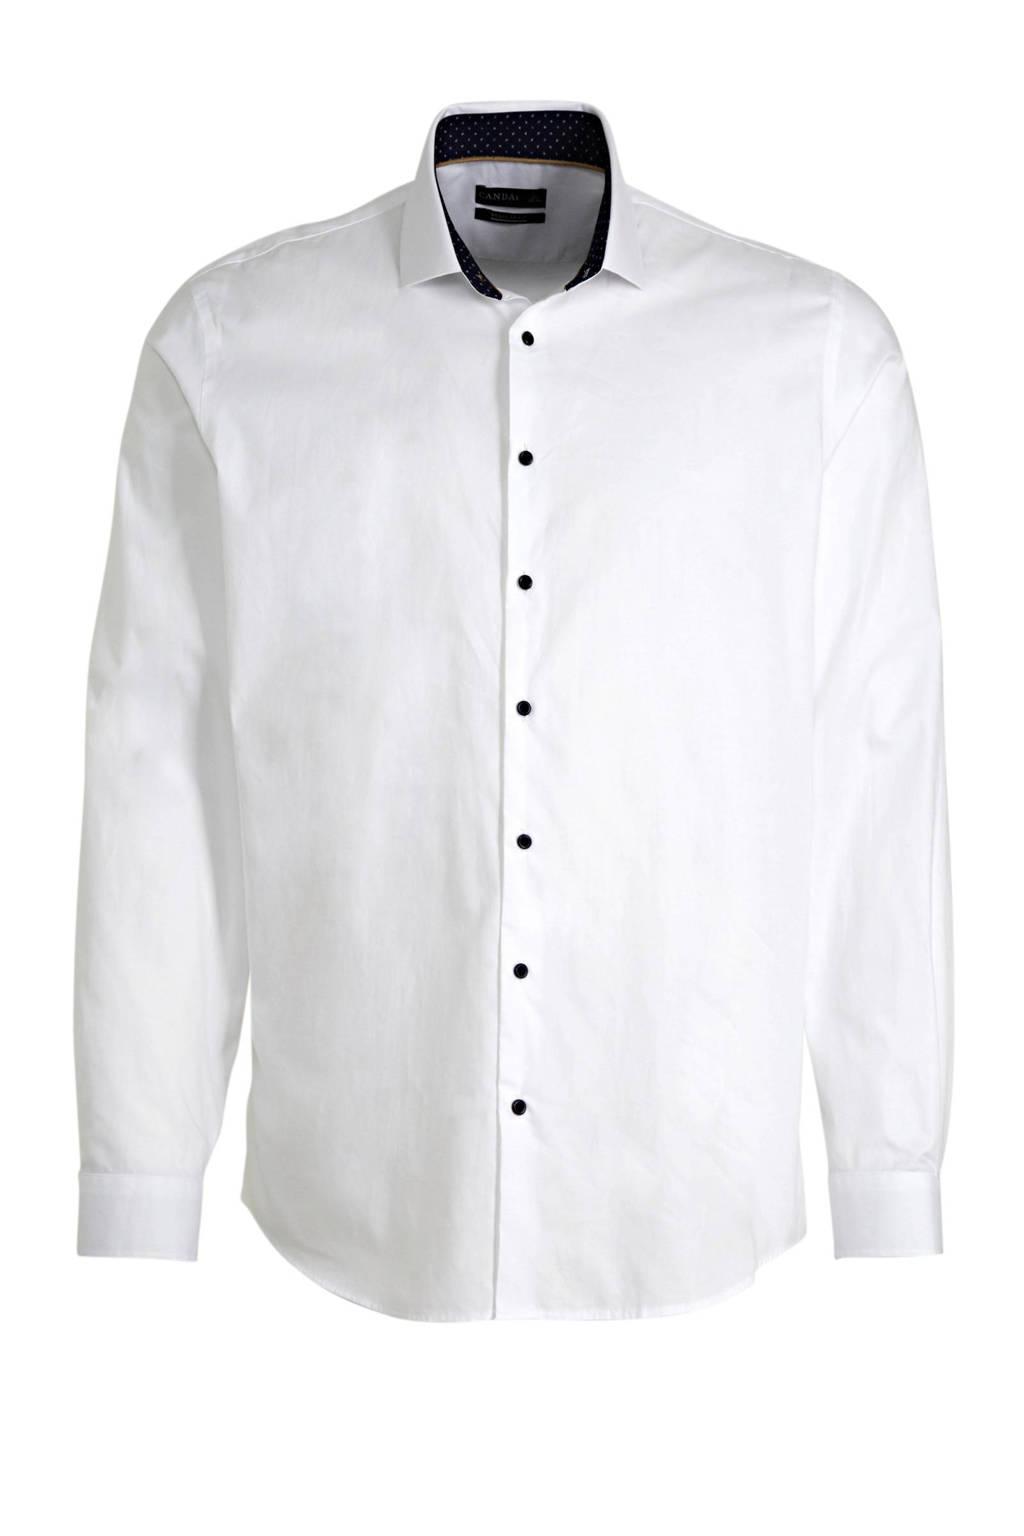 C&A Canda regular fit overhemd wit, Wit